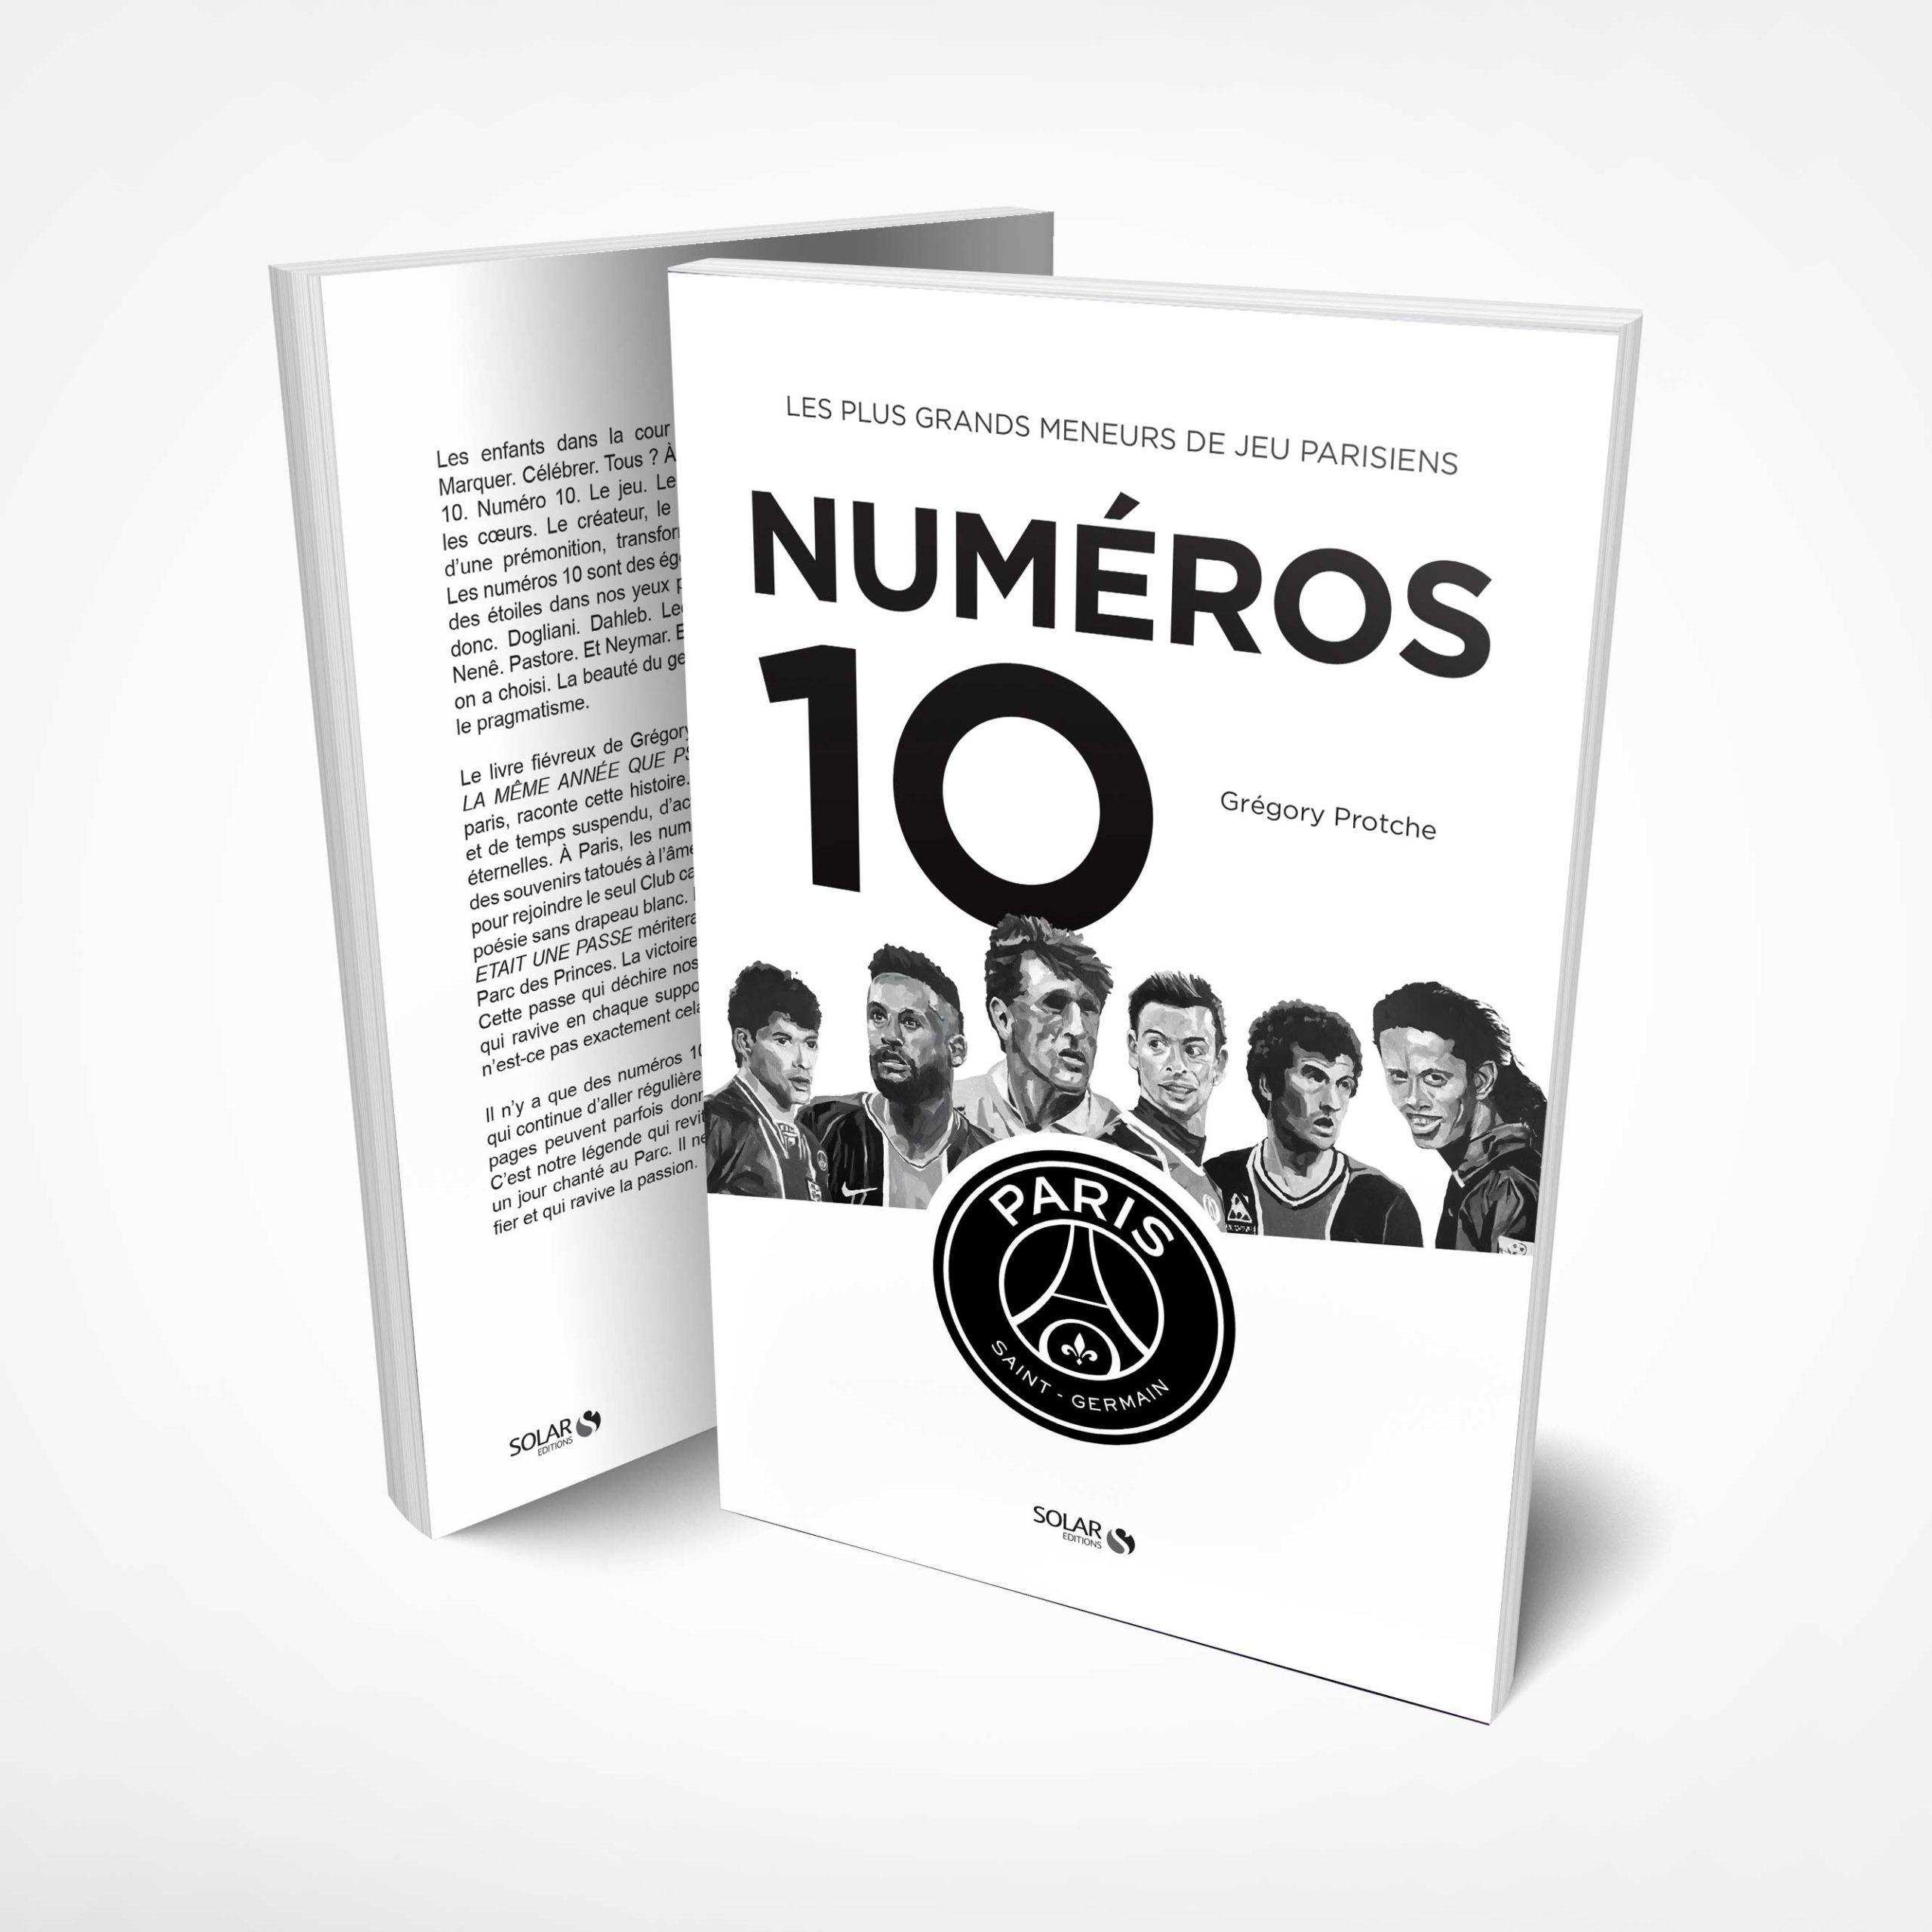 Numéros 10 Virage PSG